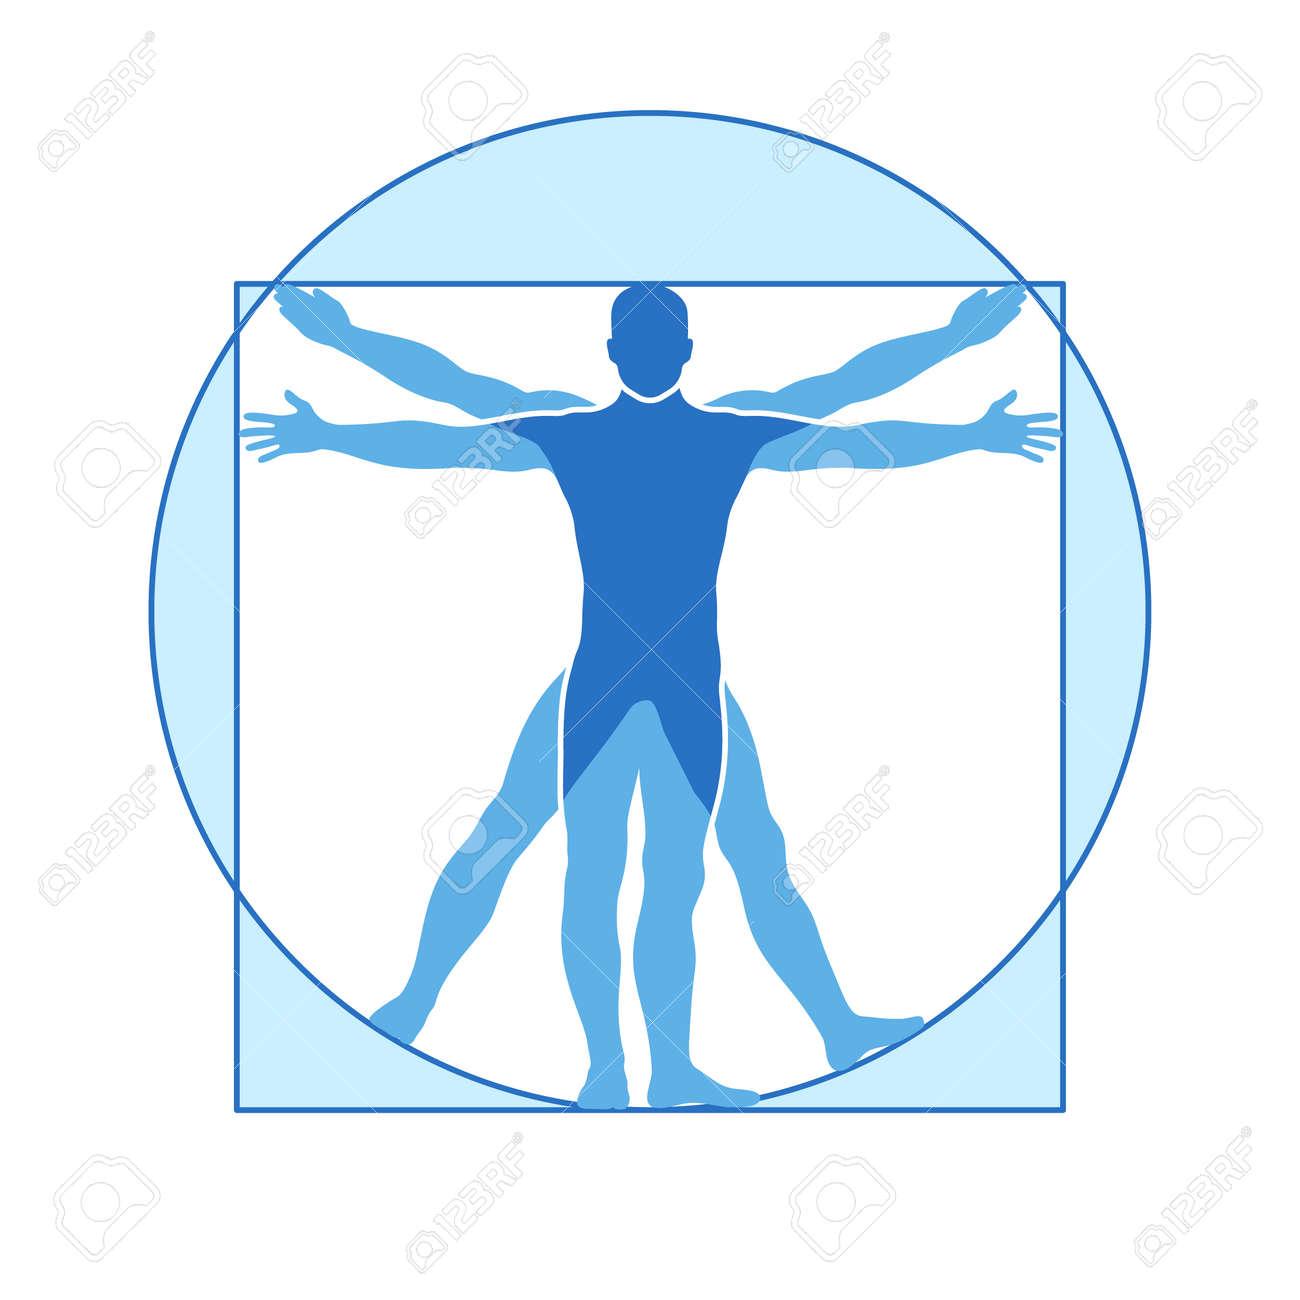 Human body vector icon similar vitruvian man. Like Leonardo da Vinci image vitruvian man, classic proportion form man illustration - 165950047